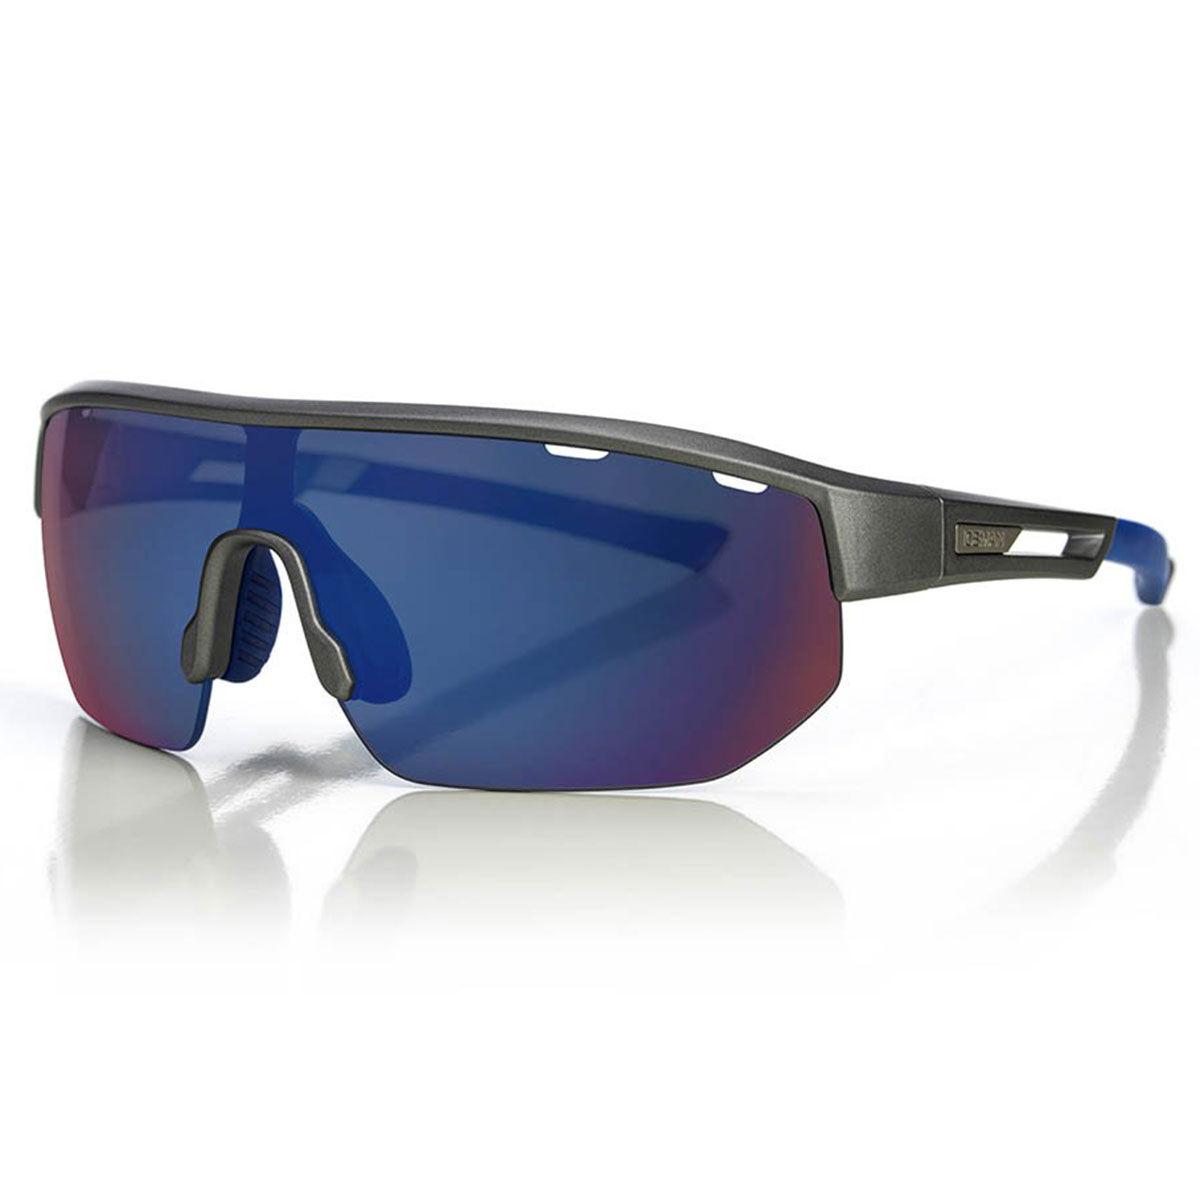 Henrik Stenson Iceman 3.0 Sunglasses, Mens, Grey/blue/smoke/blue mirror | American Golf